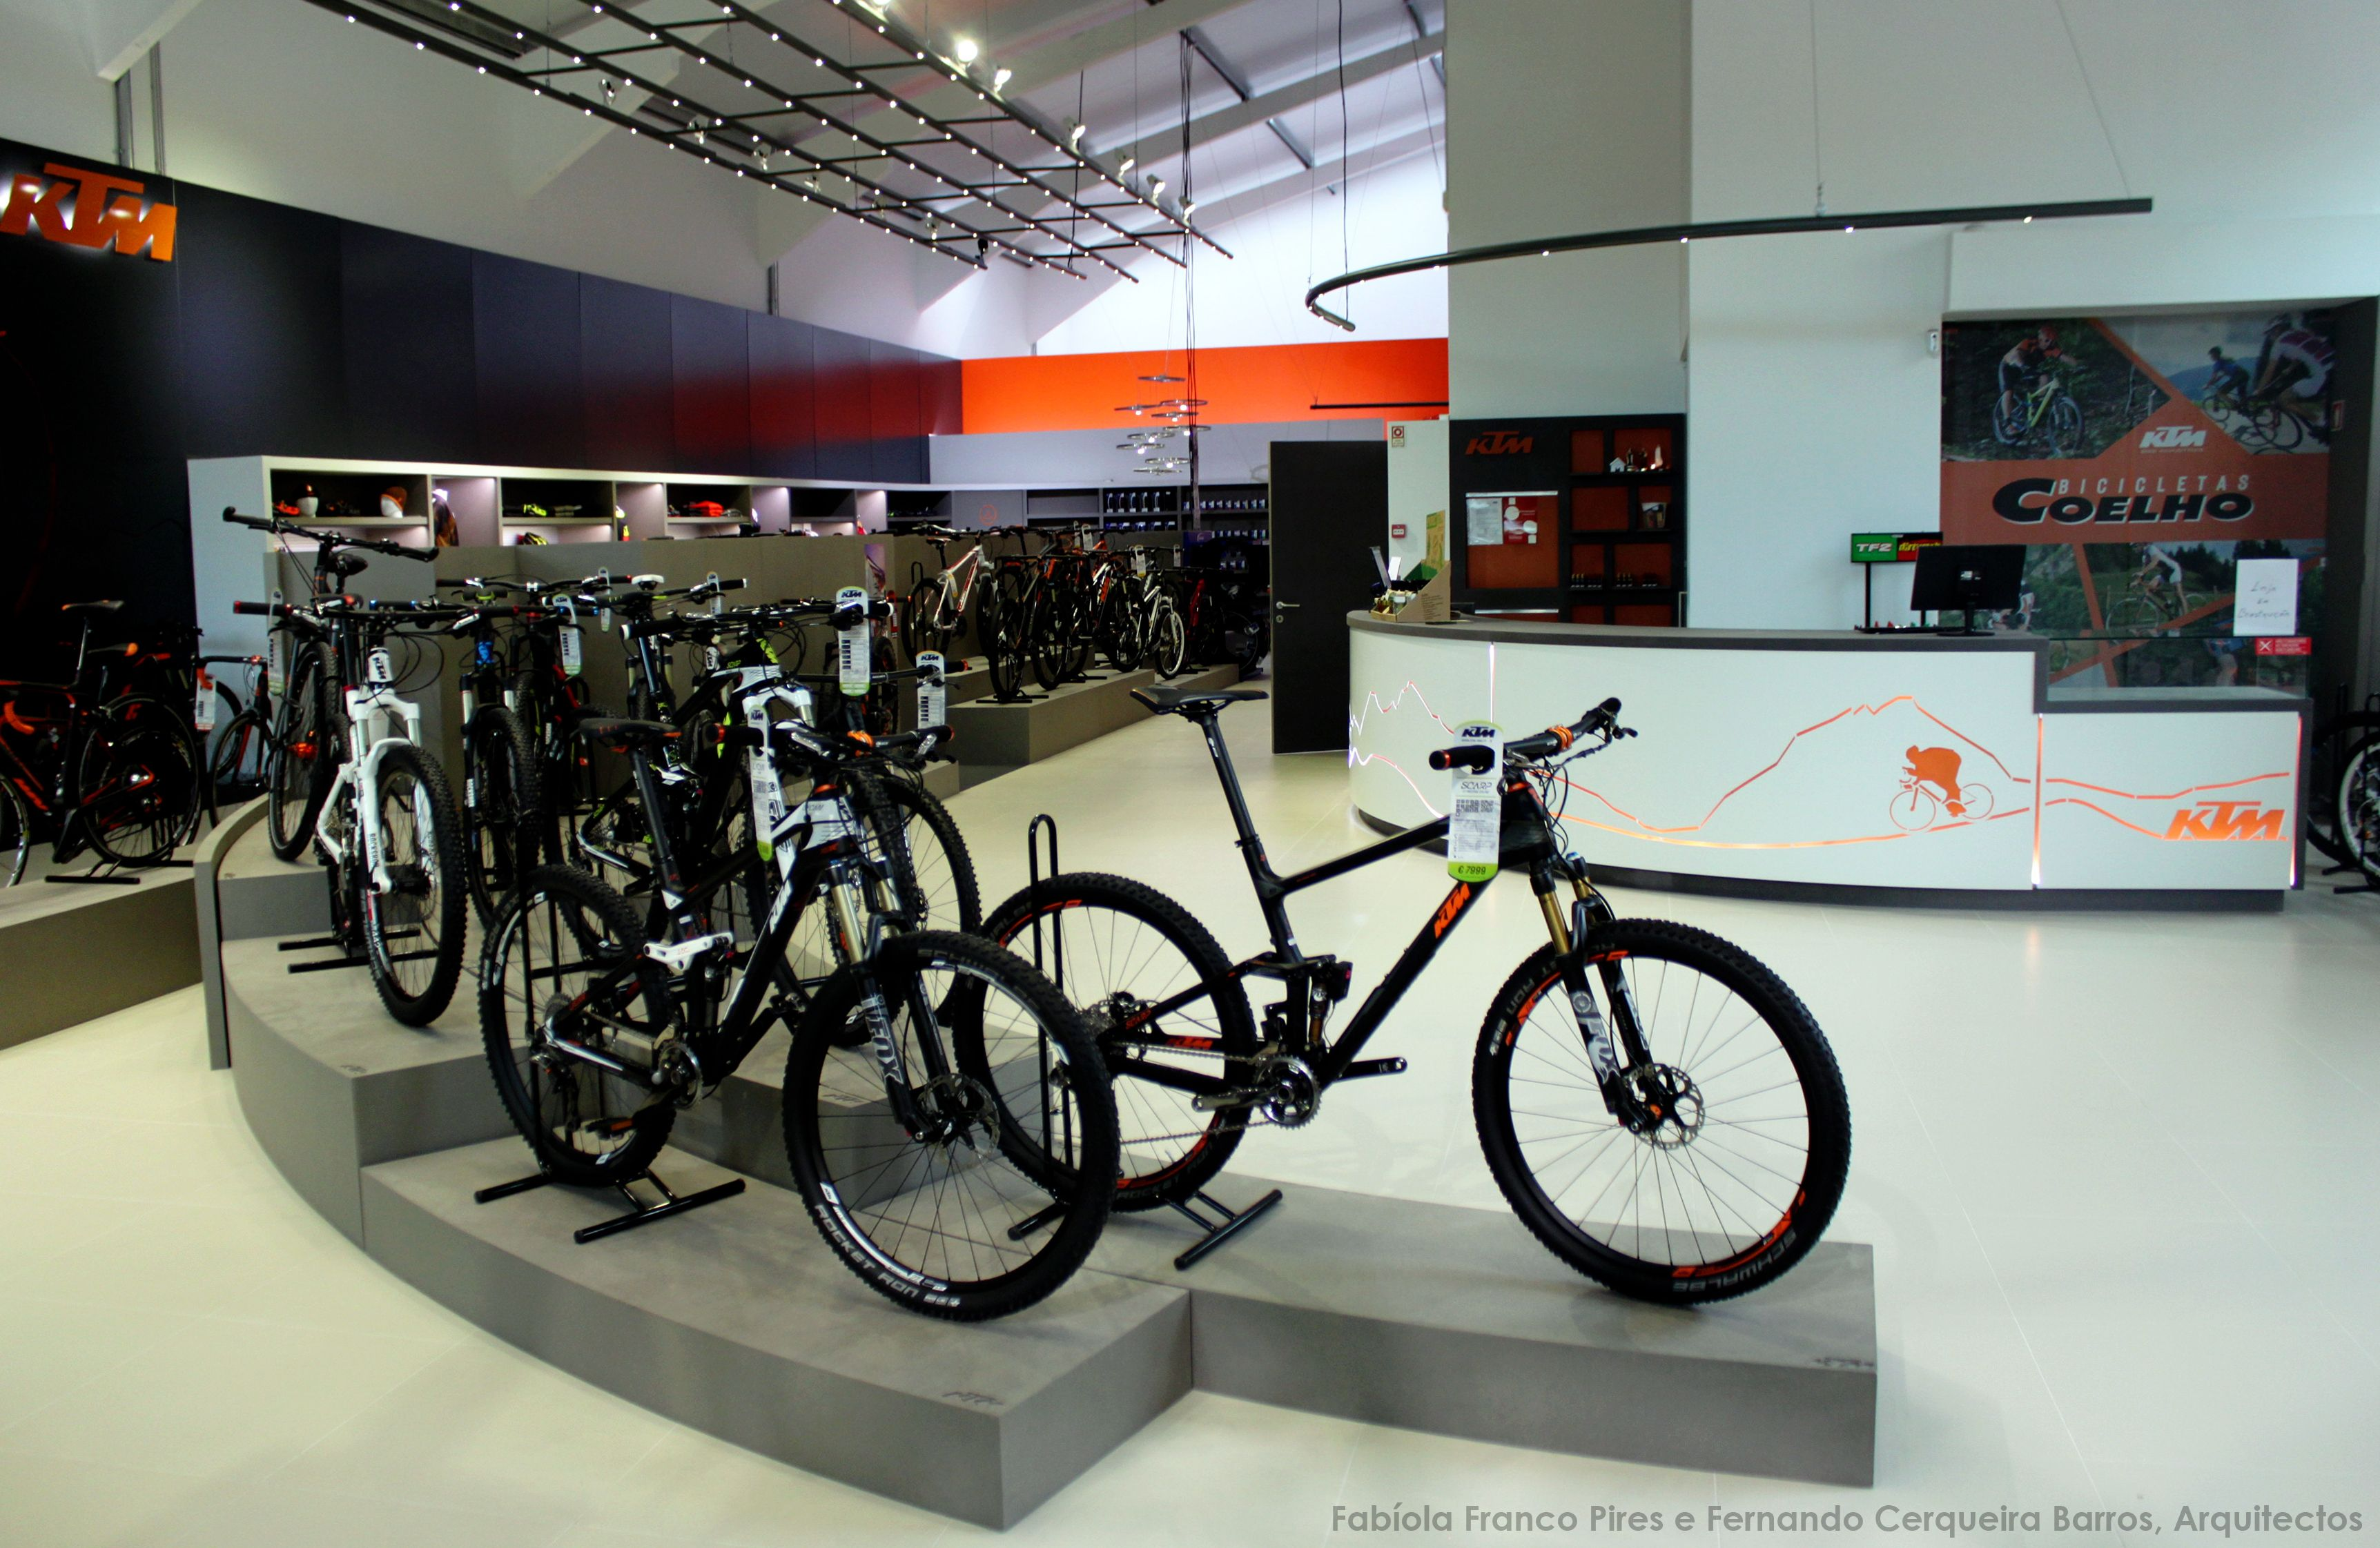 Ktm Megaconcept Store Porto Projecto Fabiola Franco Pires E